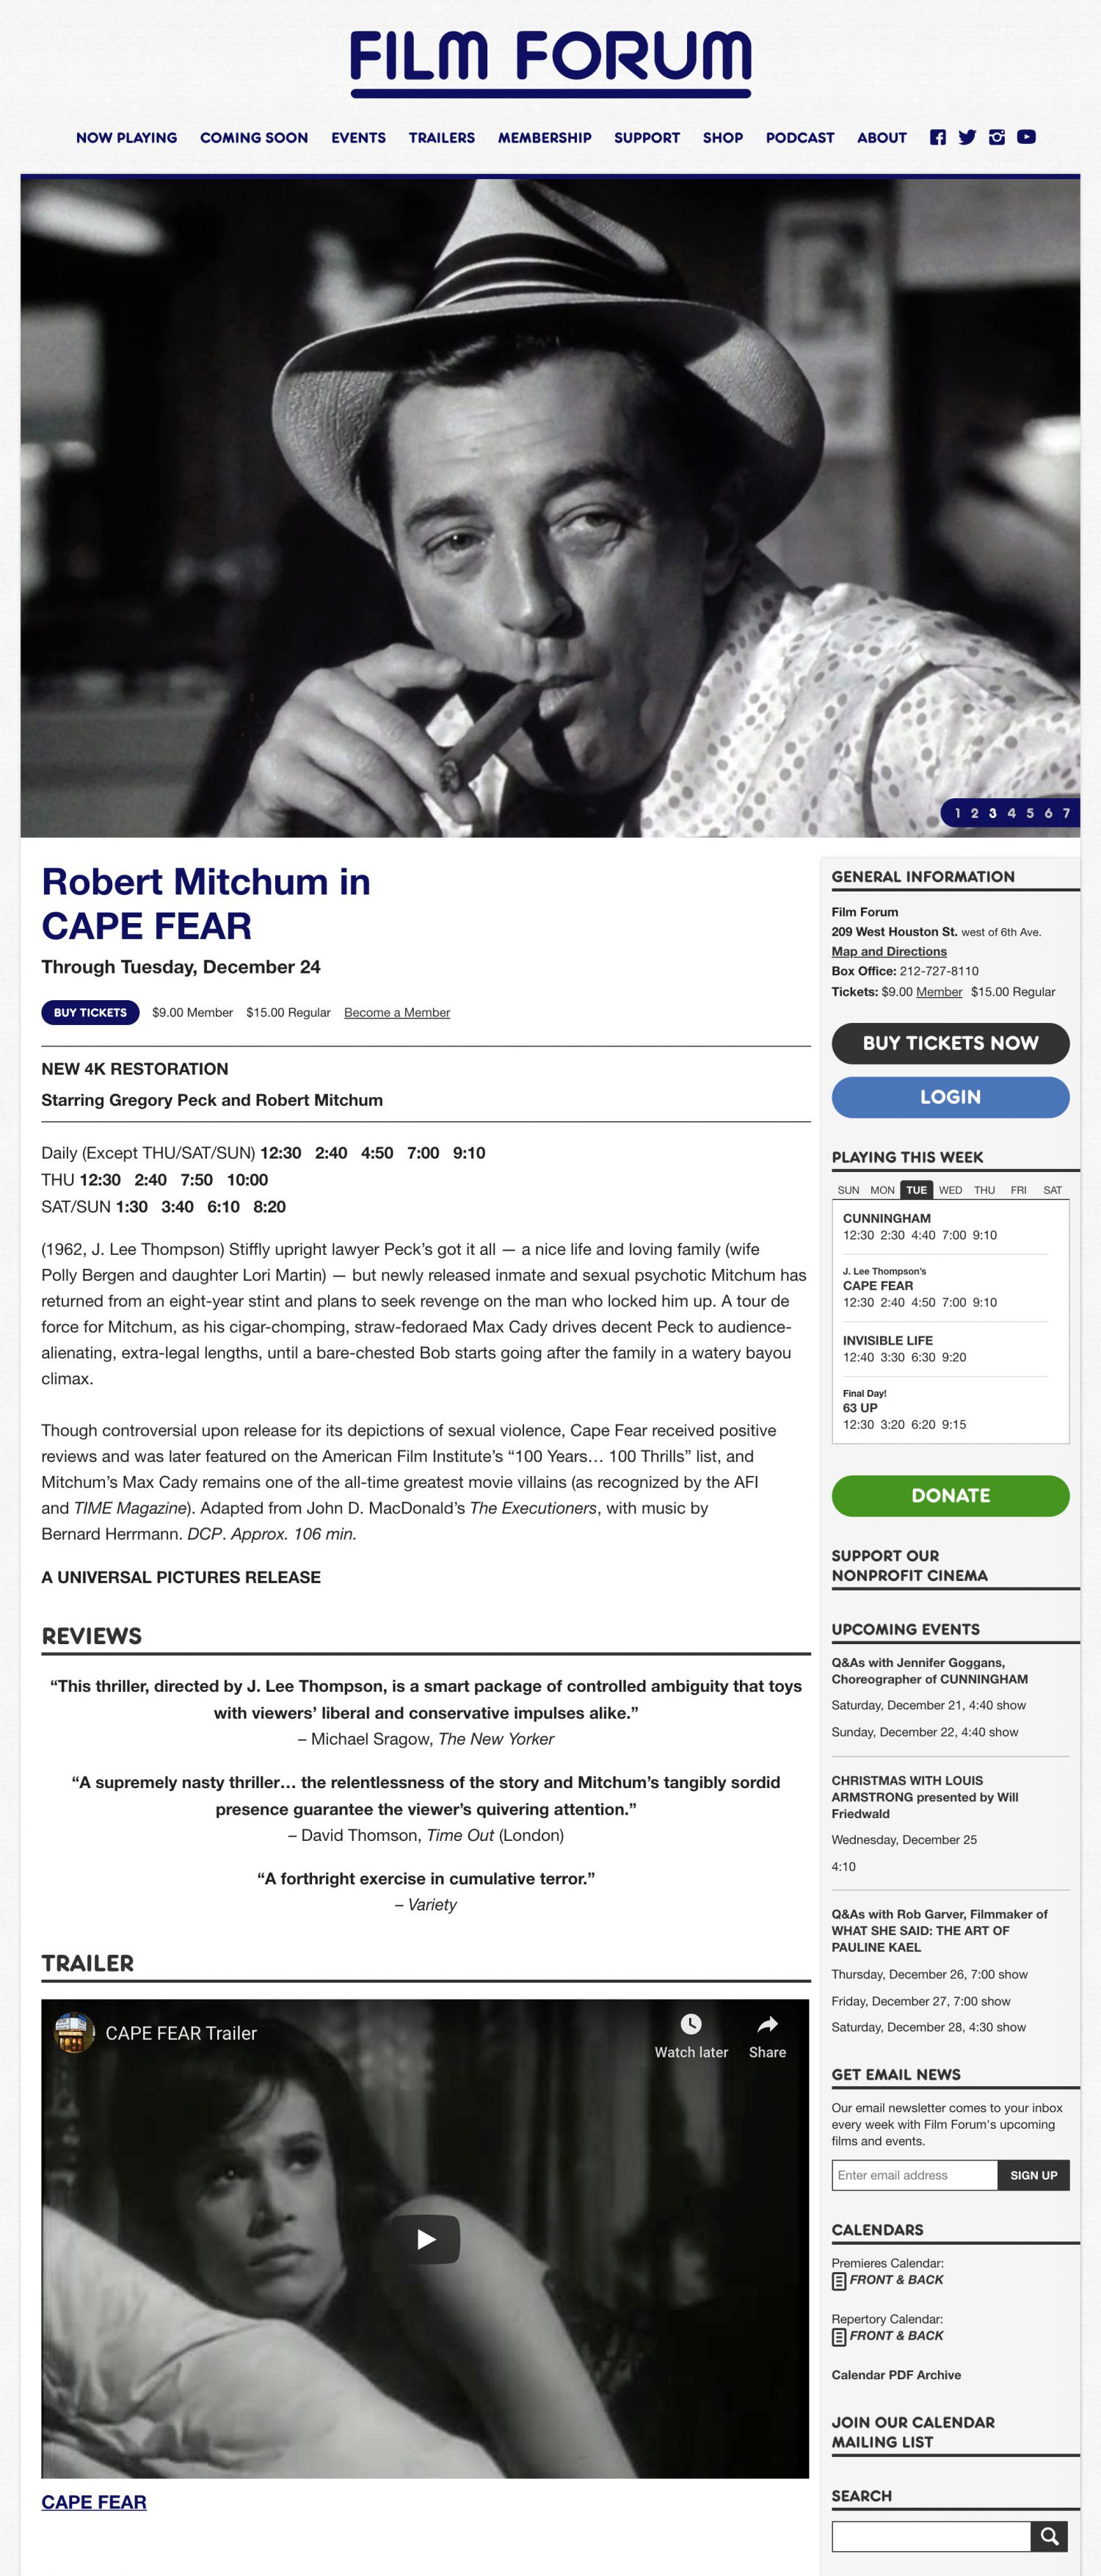 Screenshot of a Film Forum website's film detail page